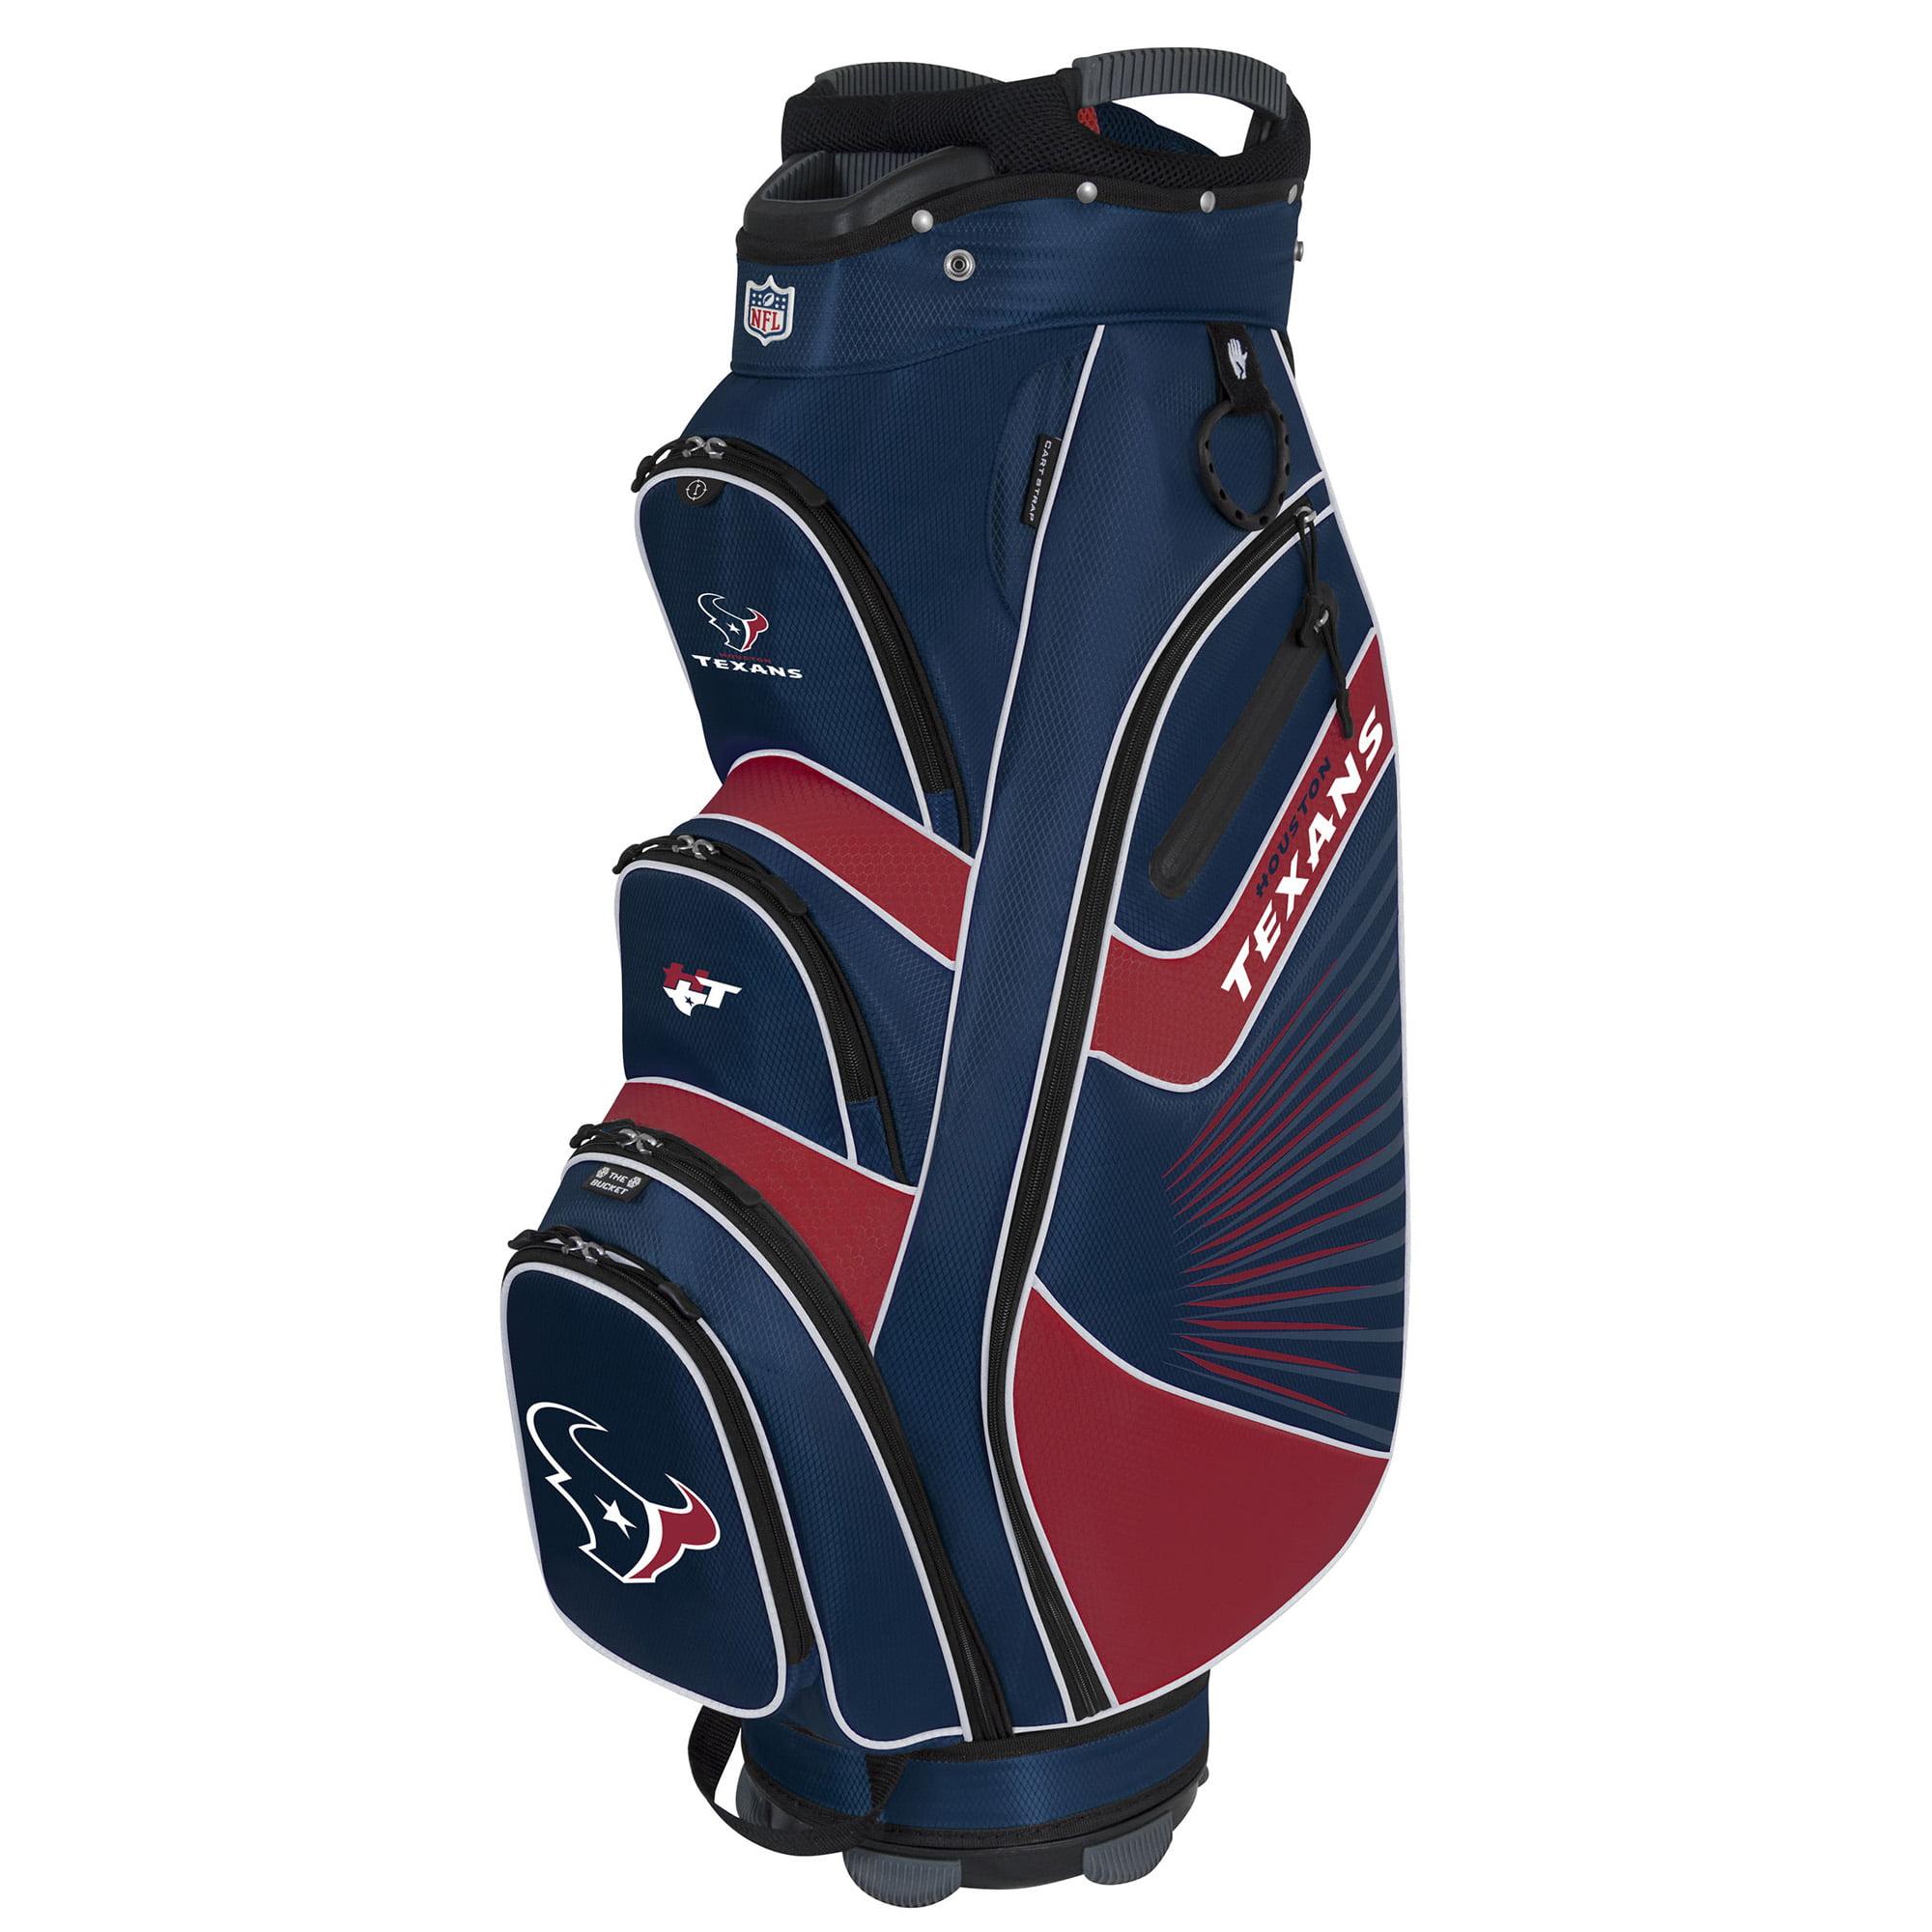 Houston Texans The Bucket II Cooler Cart Bag - No Size